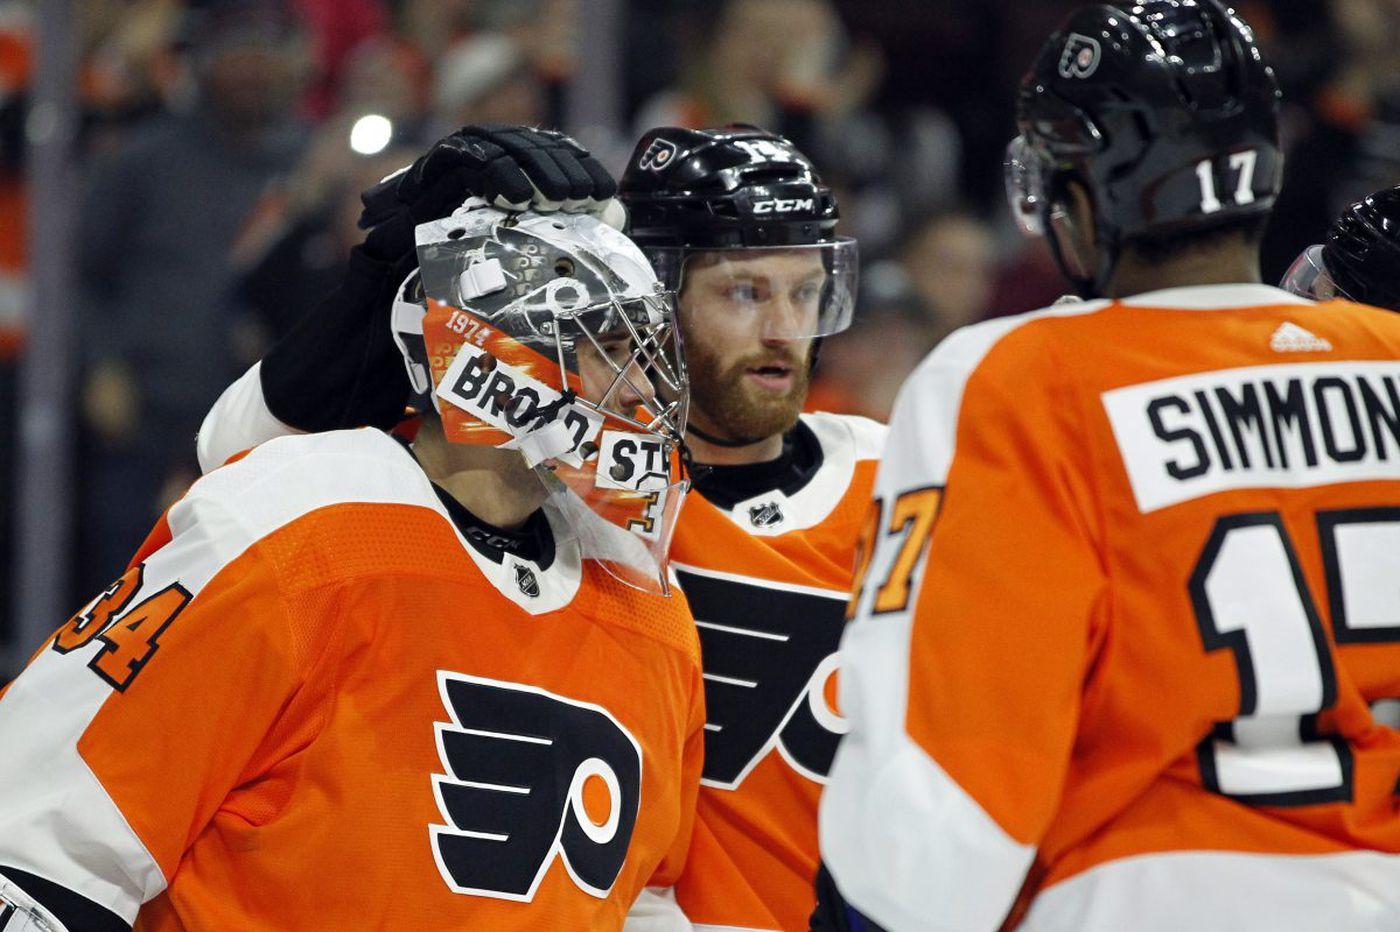 Flyers end five-game skid as Petr Mrazek keys win over Jets